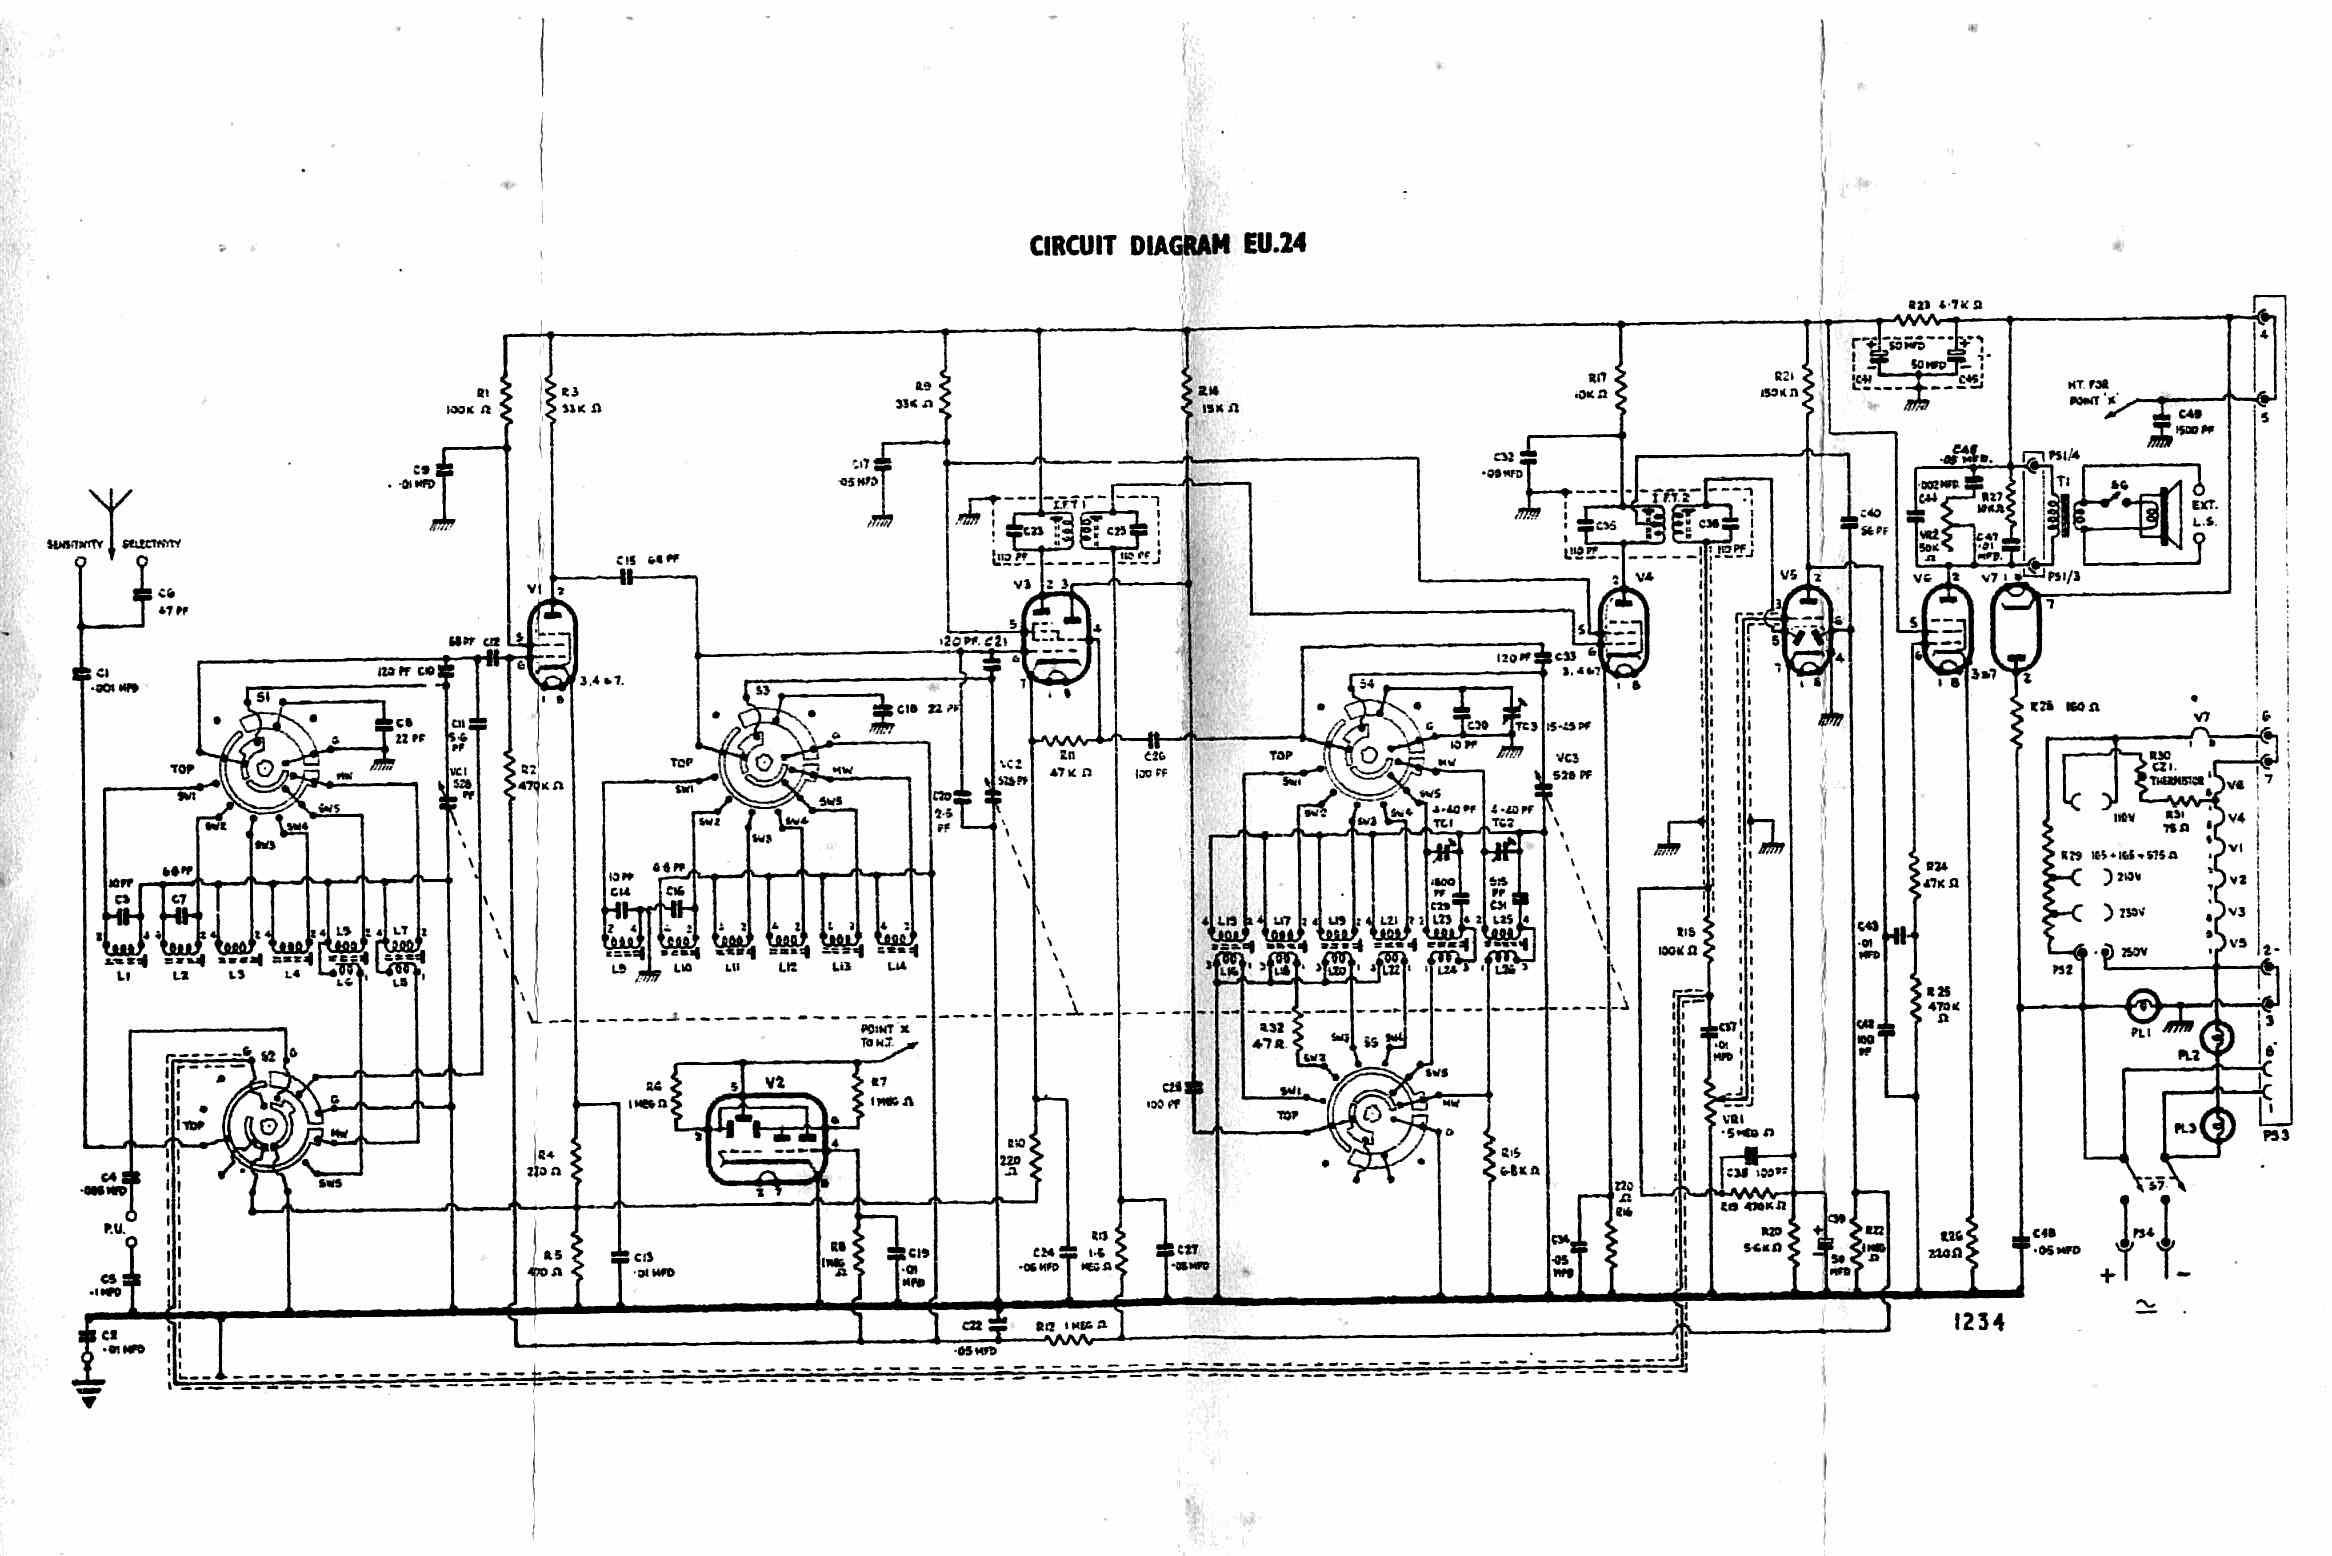 antique radio forums • view topic - bush eu24 antique radio wiring diagrams